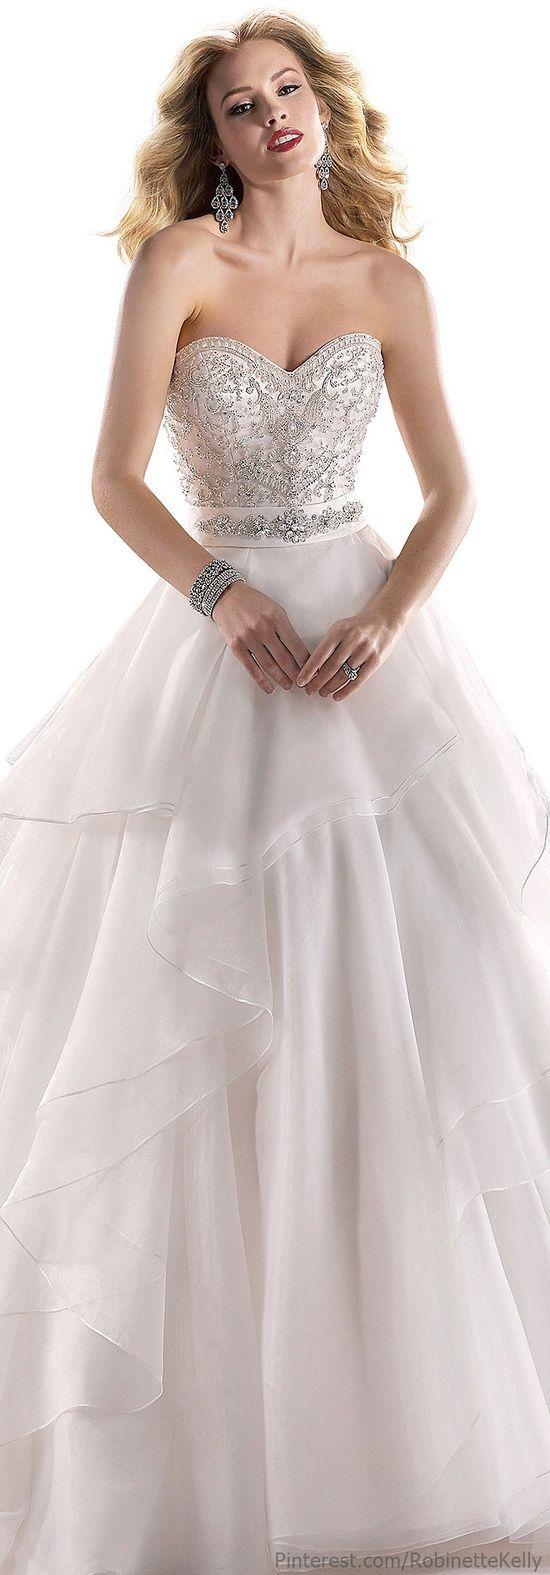 41 best beach anniversary dresses images on pinterest marriage wedding dress best wedding dress new dresses 2013 2014 ombrellifo Gallery